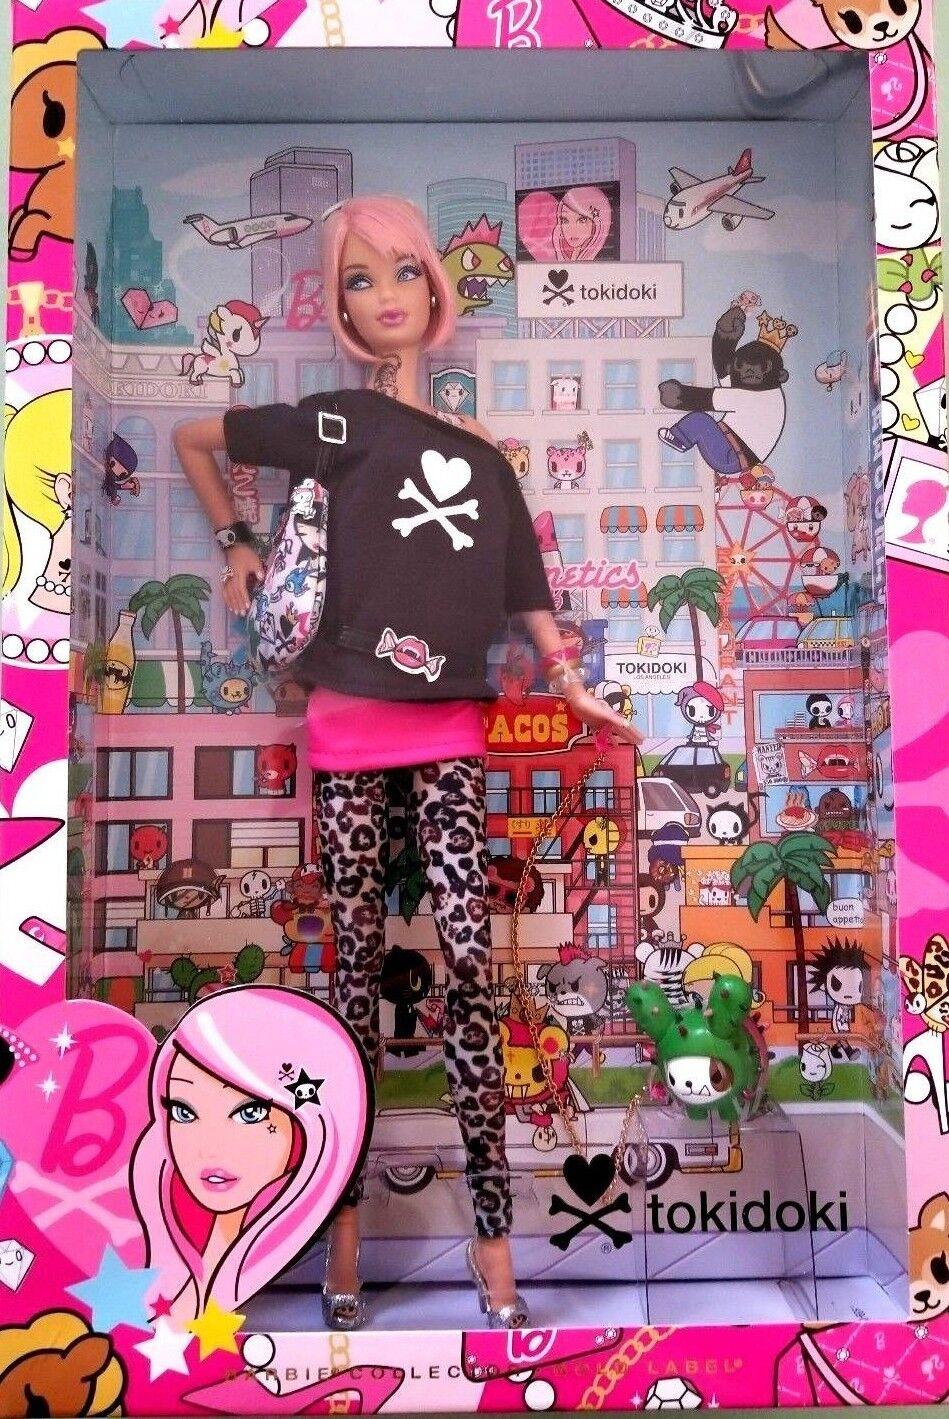 Tokidoki oro Label 2011 Barbie Collector Muñeca Raro Simone Legno Primera Edición Nuevo En Caja